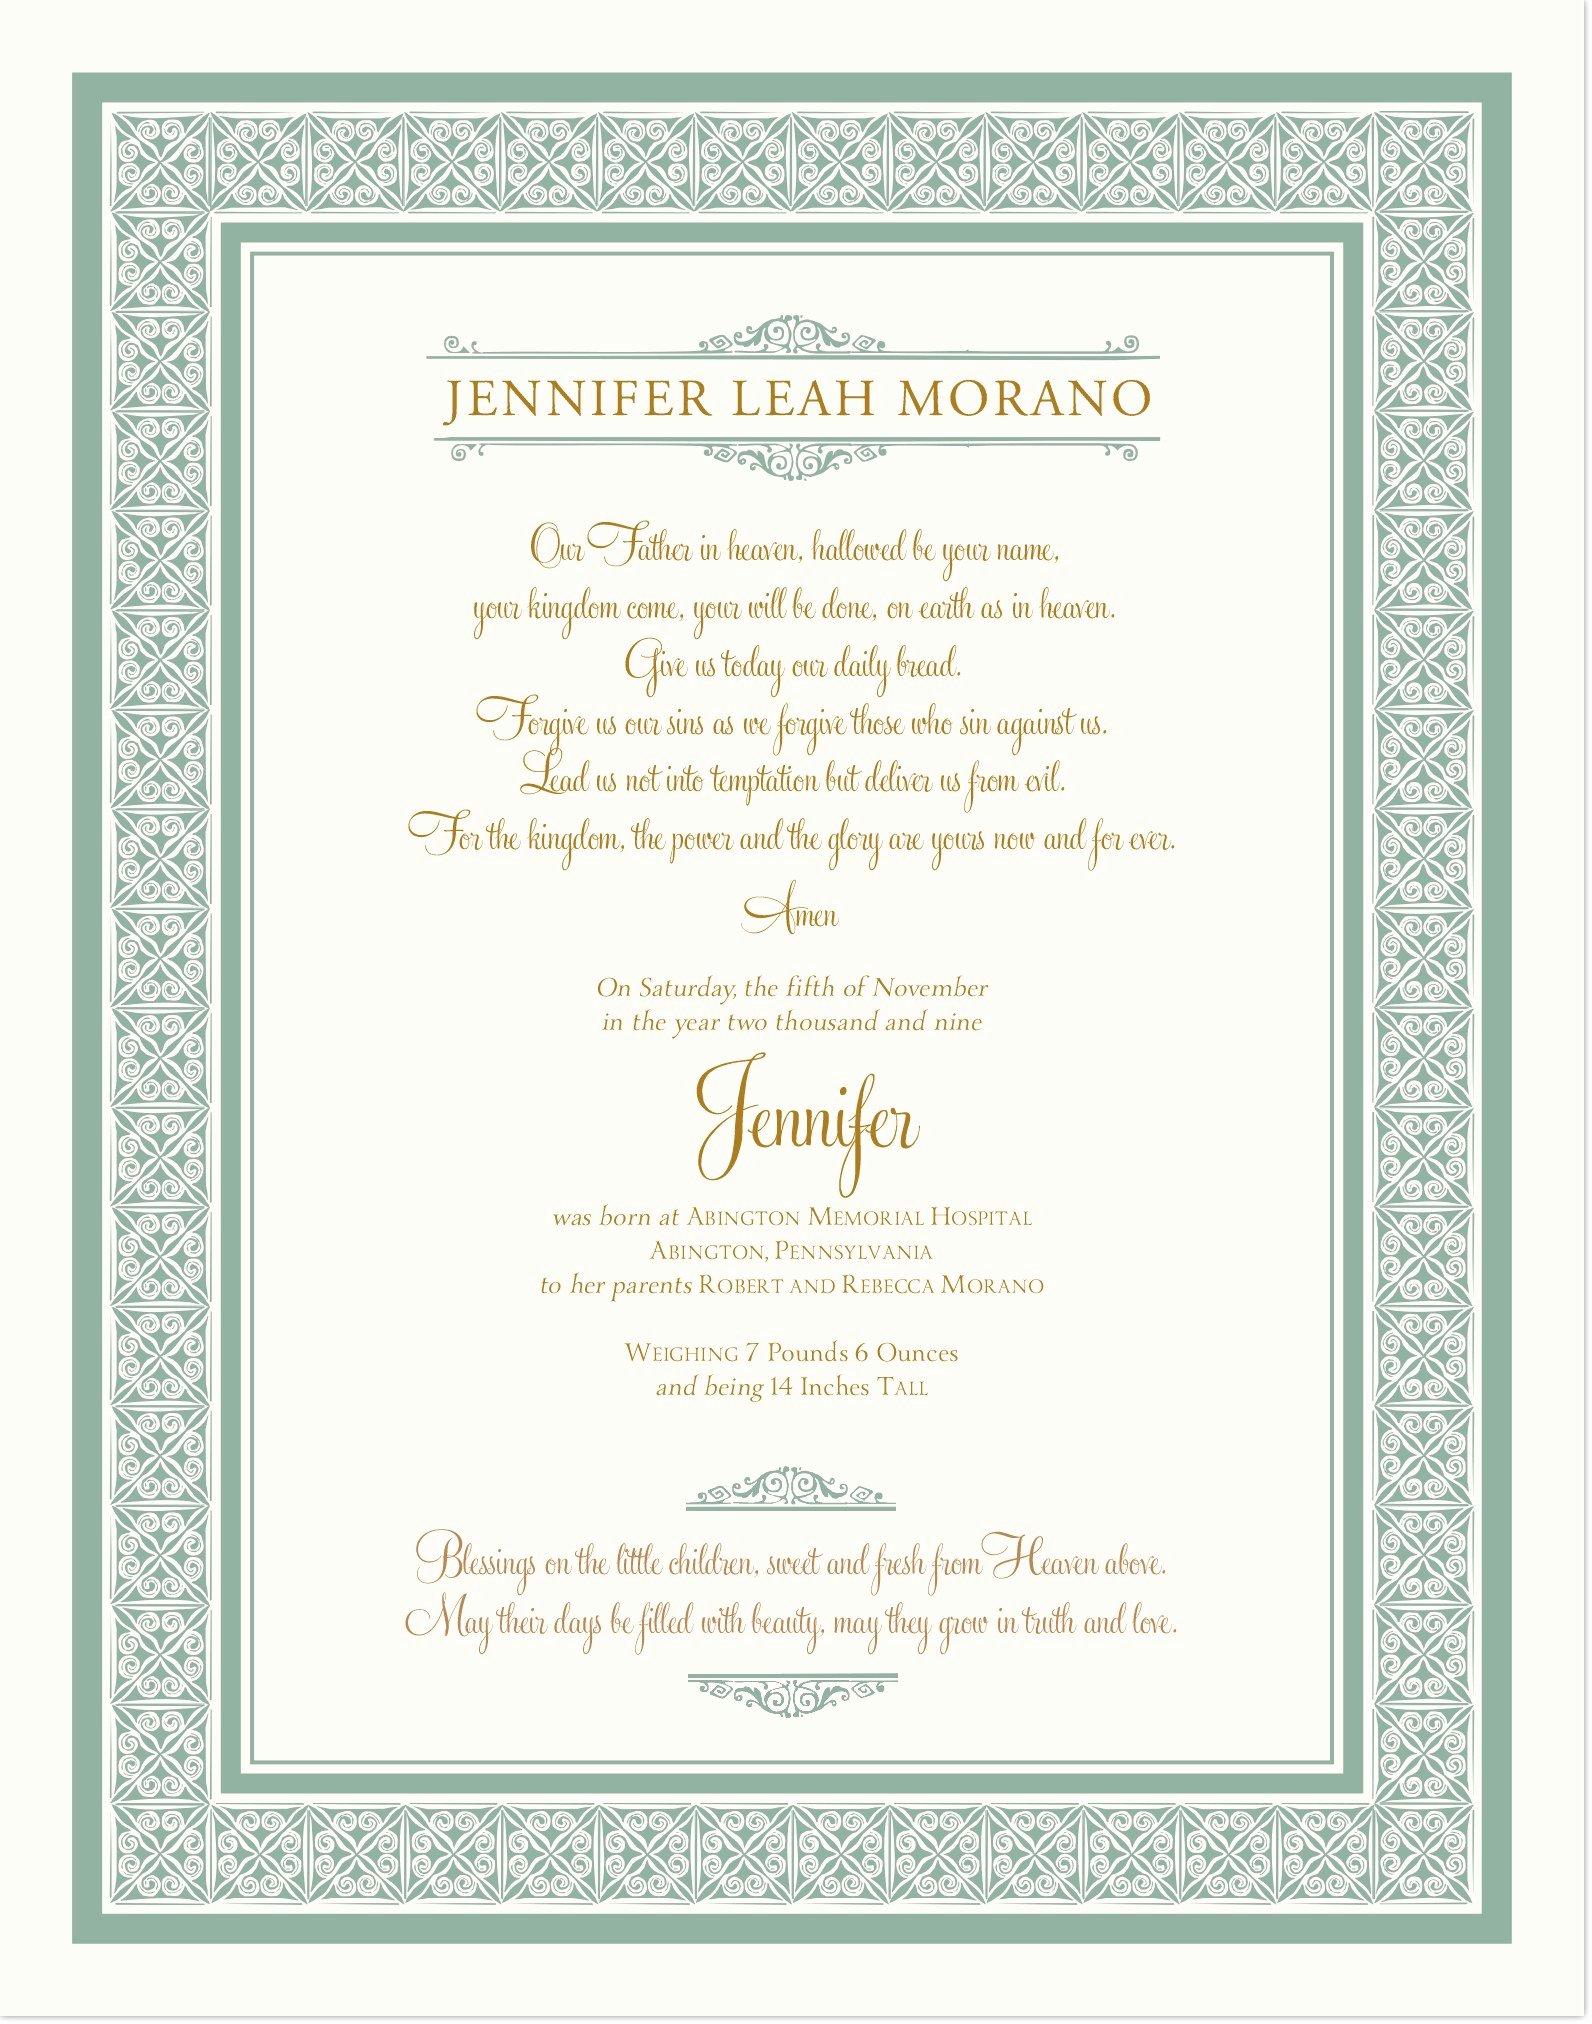 Baby Dedication Certificate Borders Elegant Birth Certificate Christening Certificate